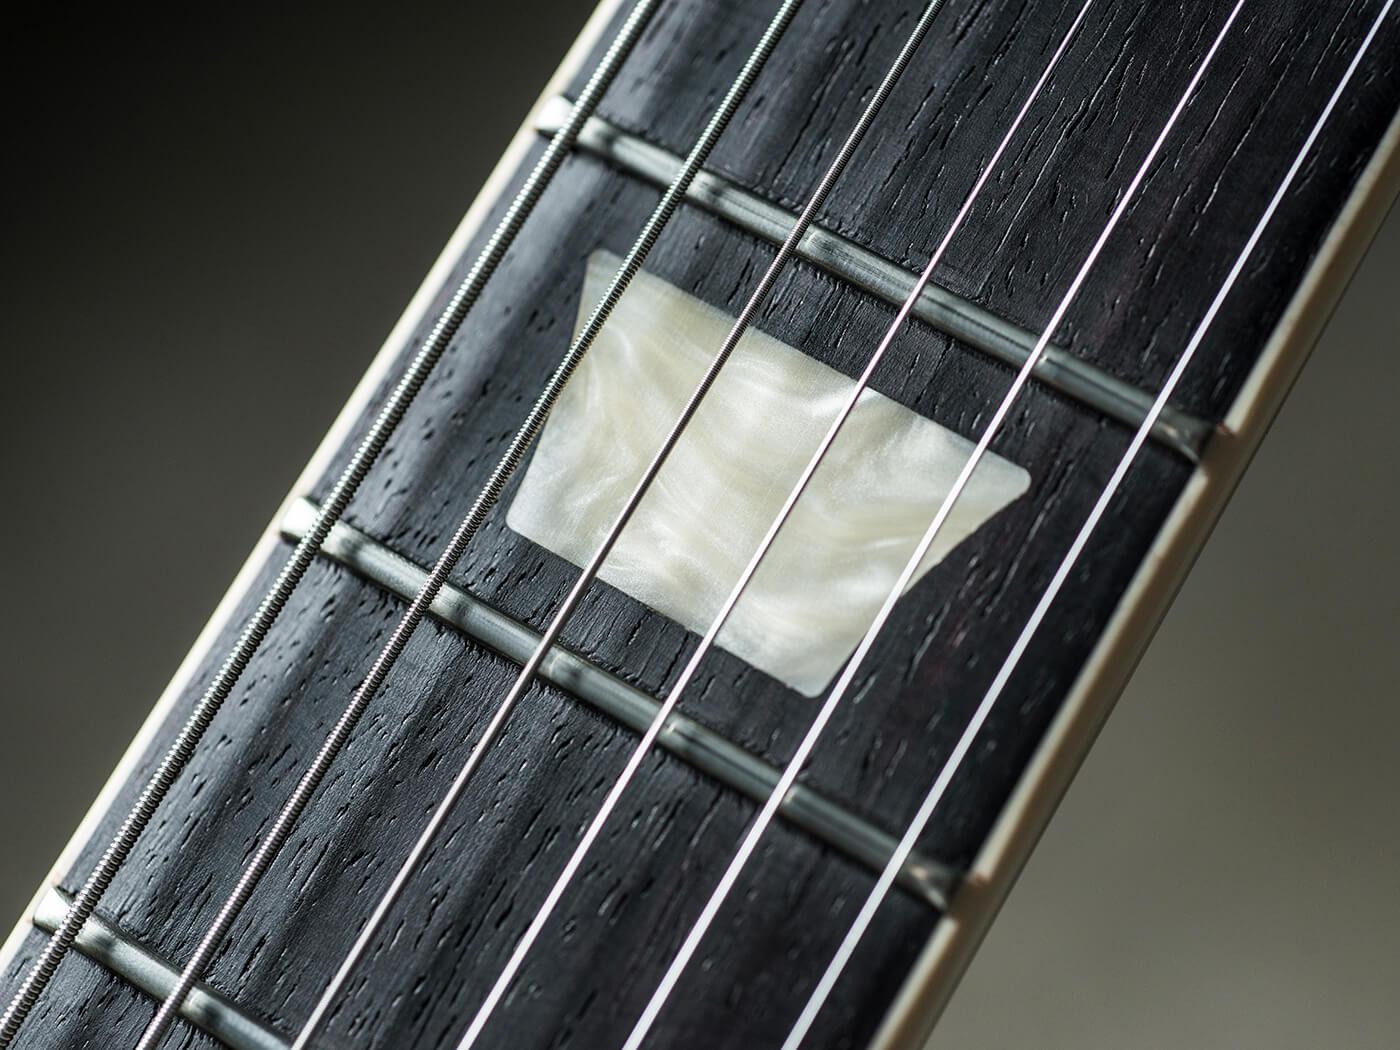 Gibson Slash Signature Les Paul (Fretboard)